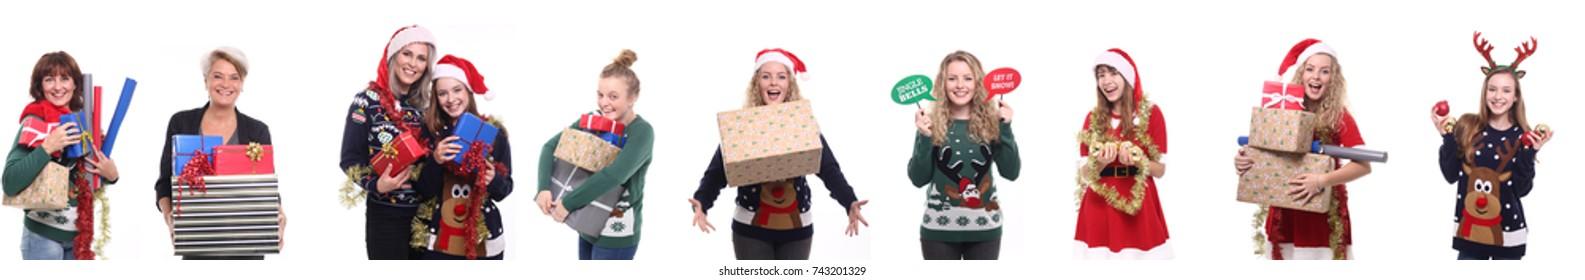 Group of christmas people